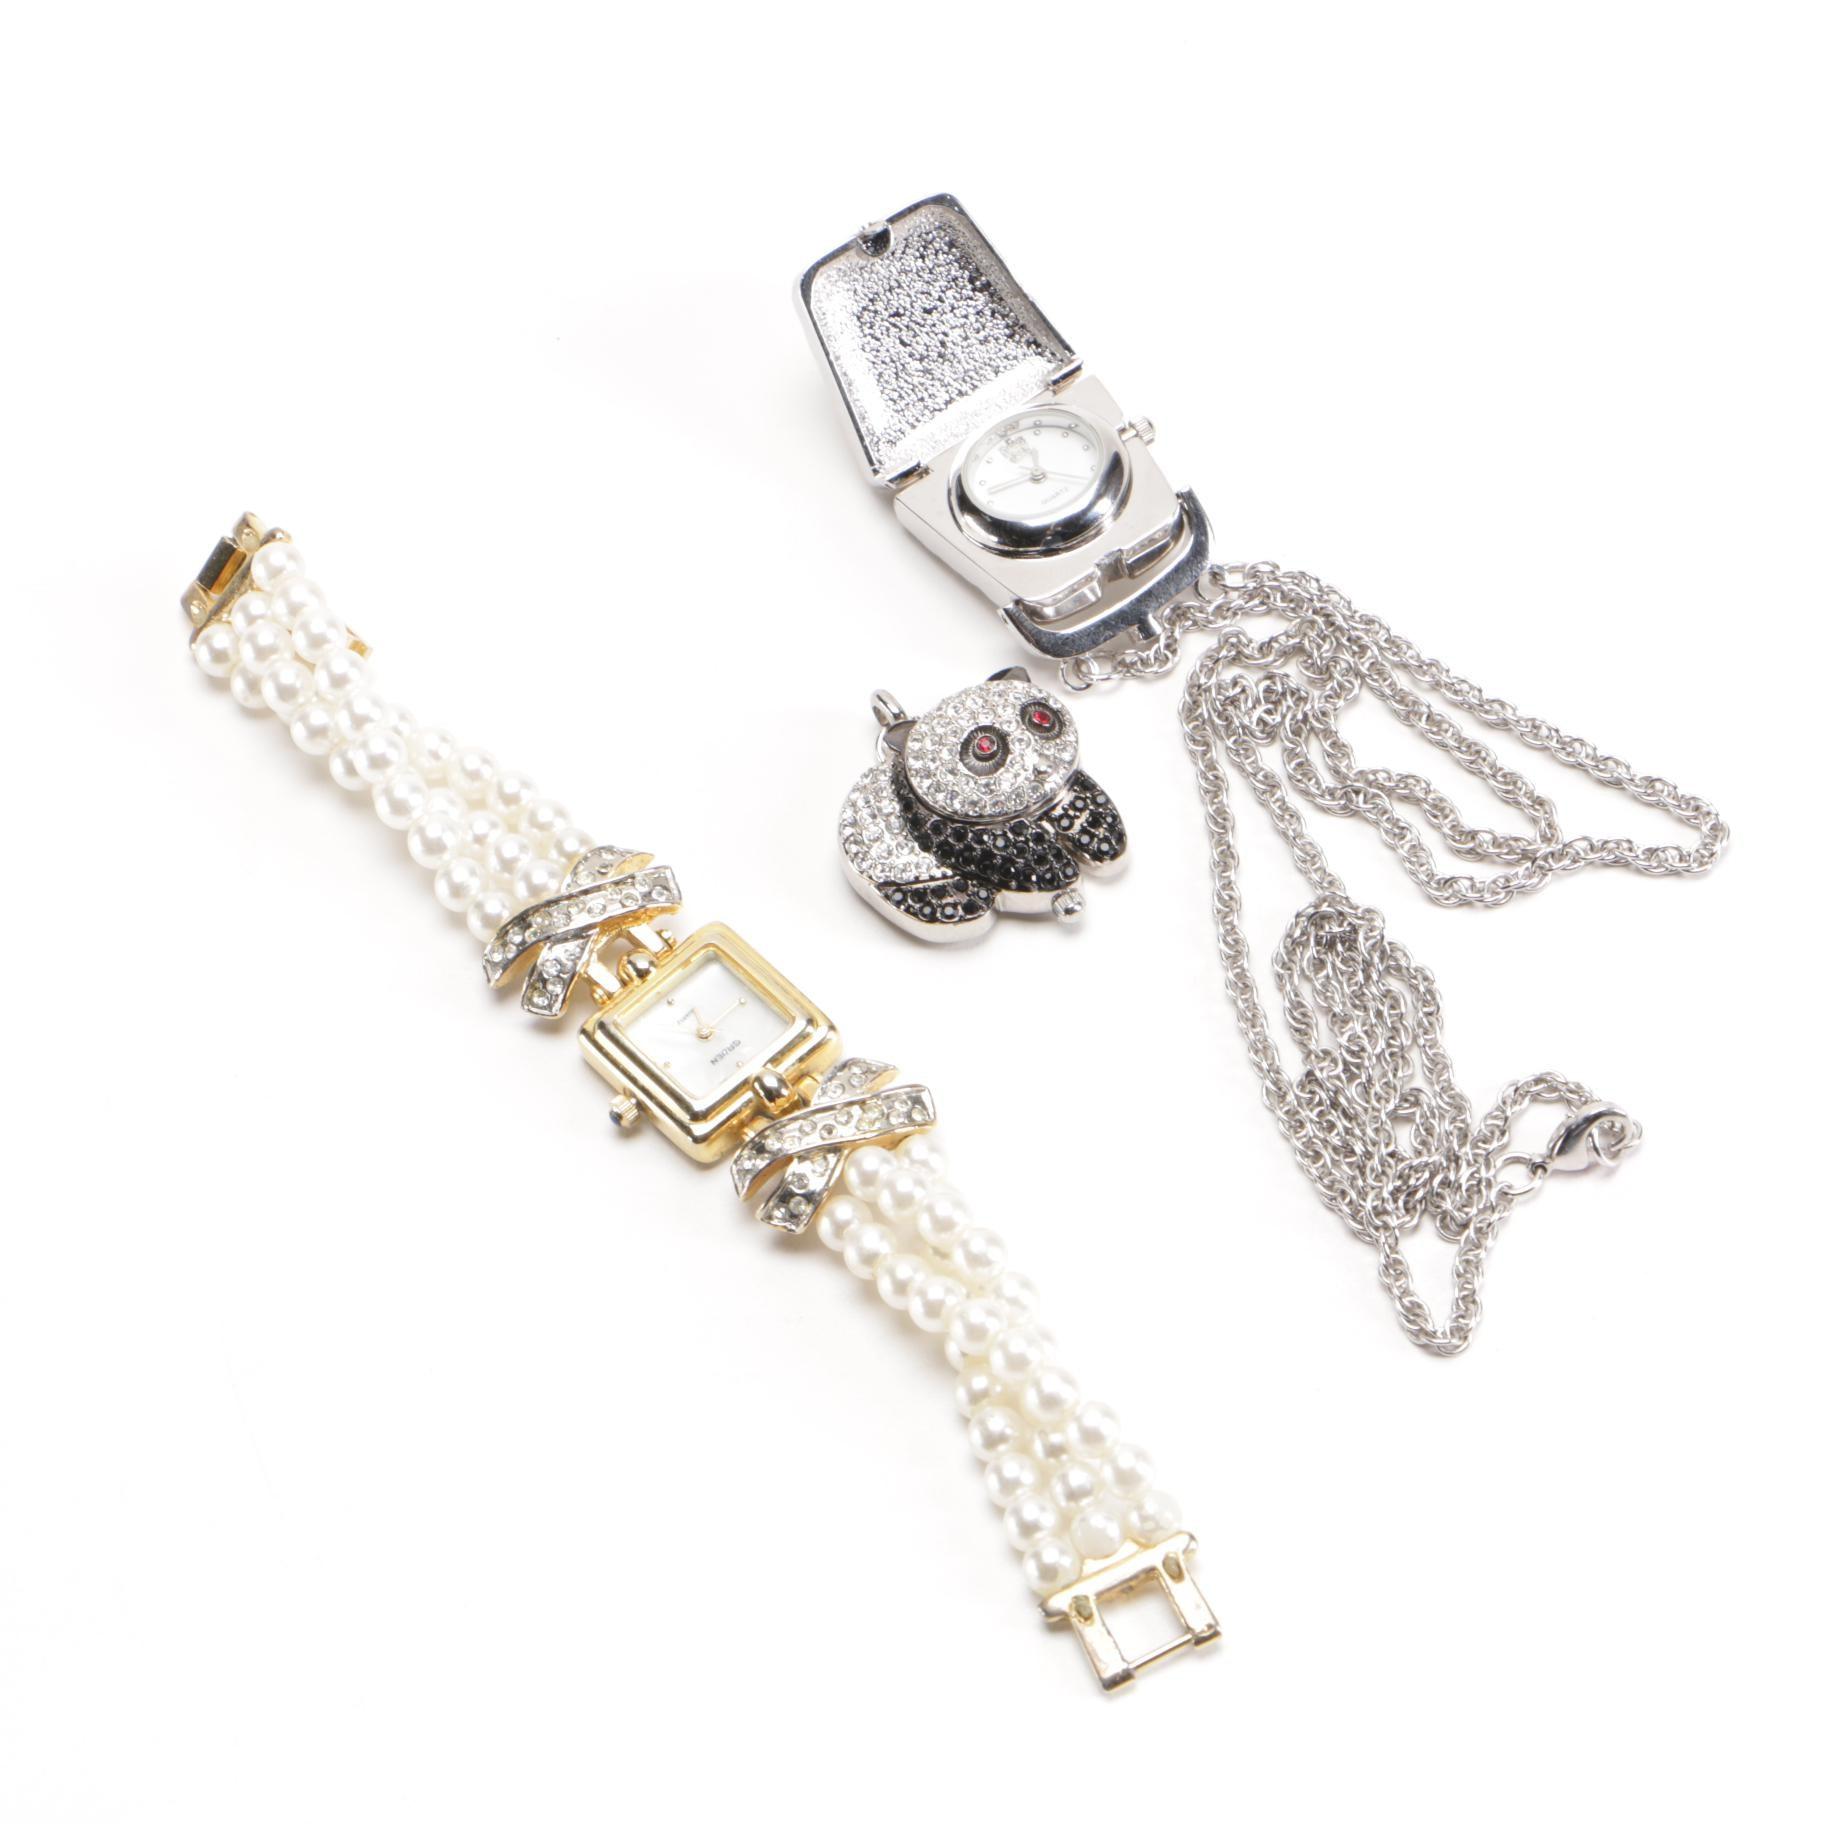 Womenu0027s Costume Jewelry Watches Including Gruen ...  sc 1 st  EBTH.com & Womenu0027s Costume Jewelry Watches Including Gruen : EBTH